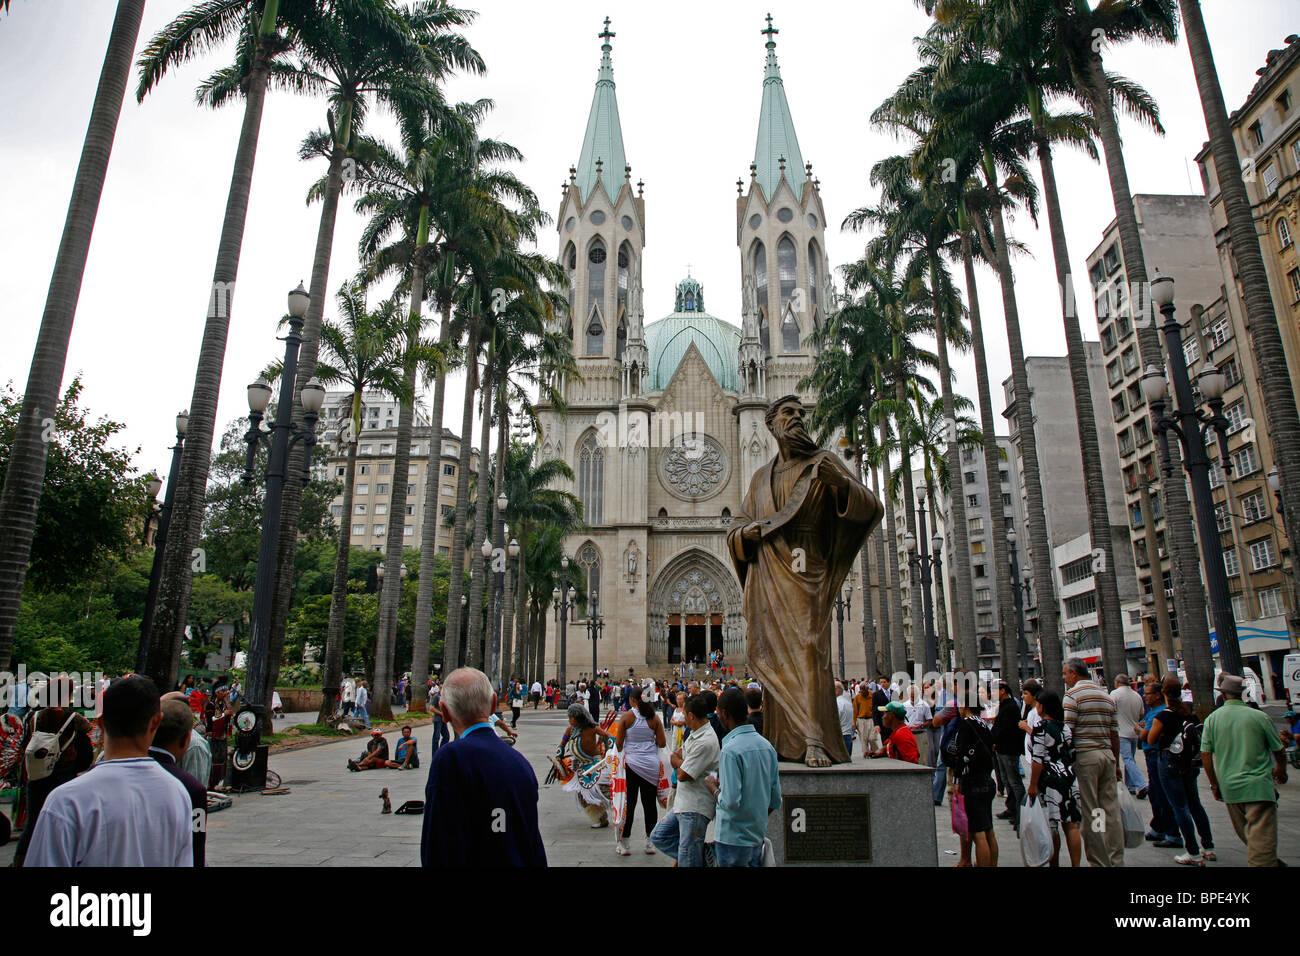 Catedral da Se, Sao Paulo, Brasil. Imagen De Stock